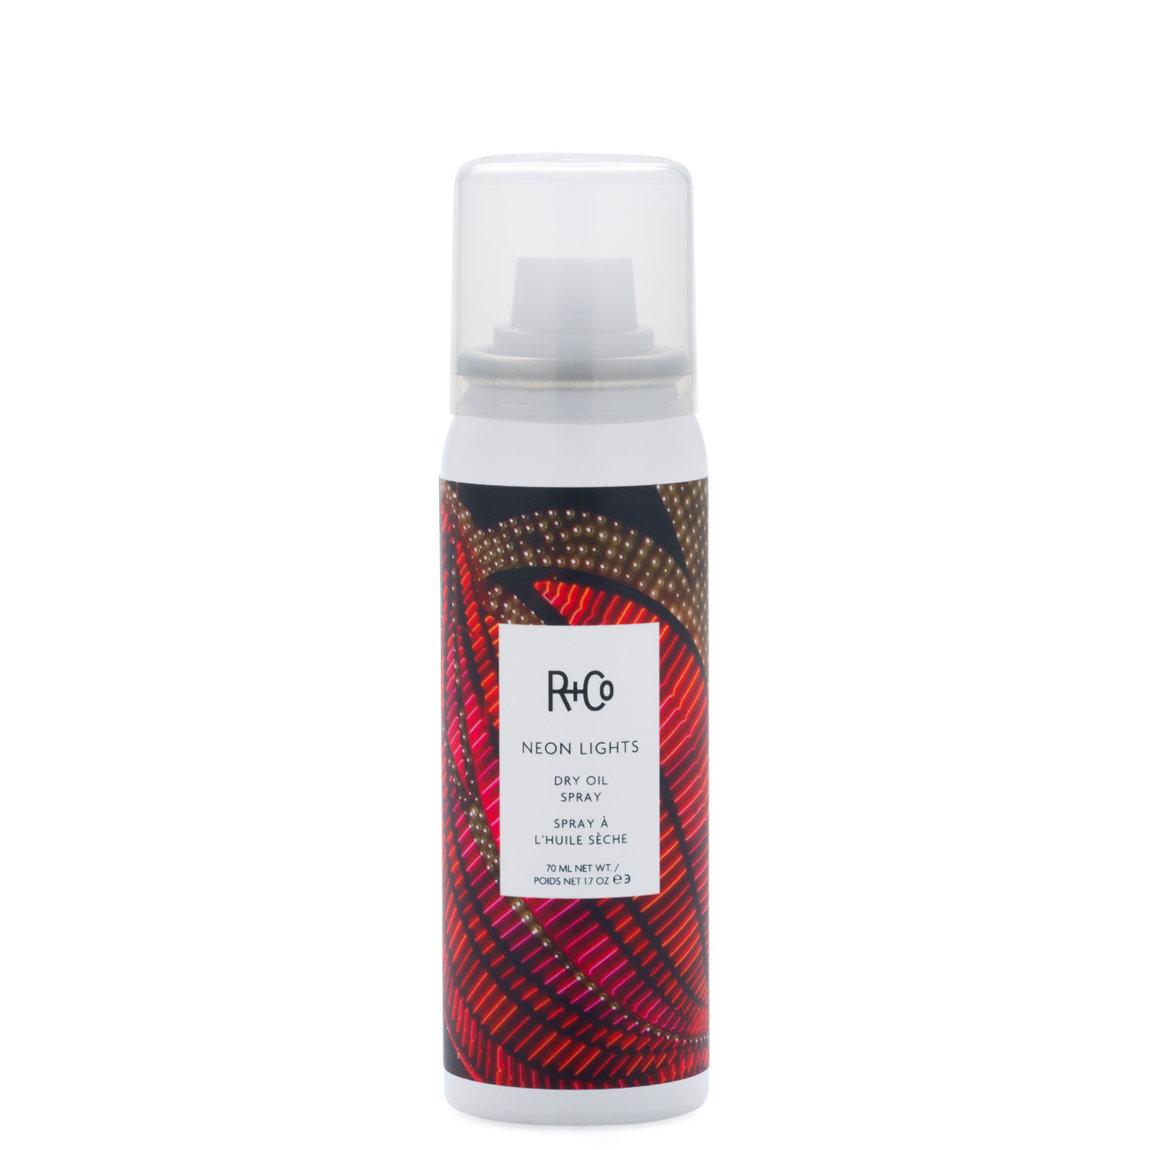 R+Co Neon Lights Dry Oil Spray 1.7 fl oz alternative view 1 - product swatch.